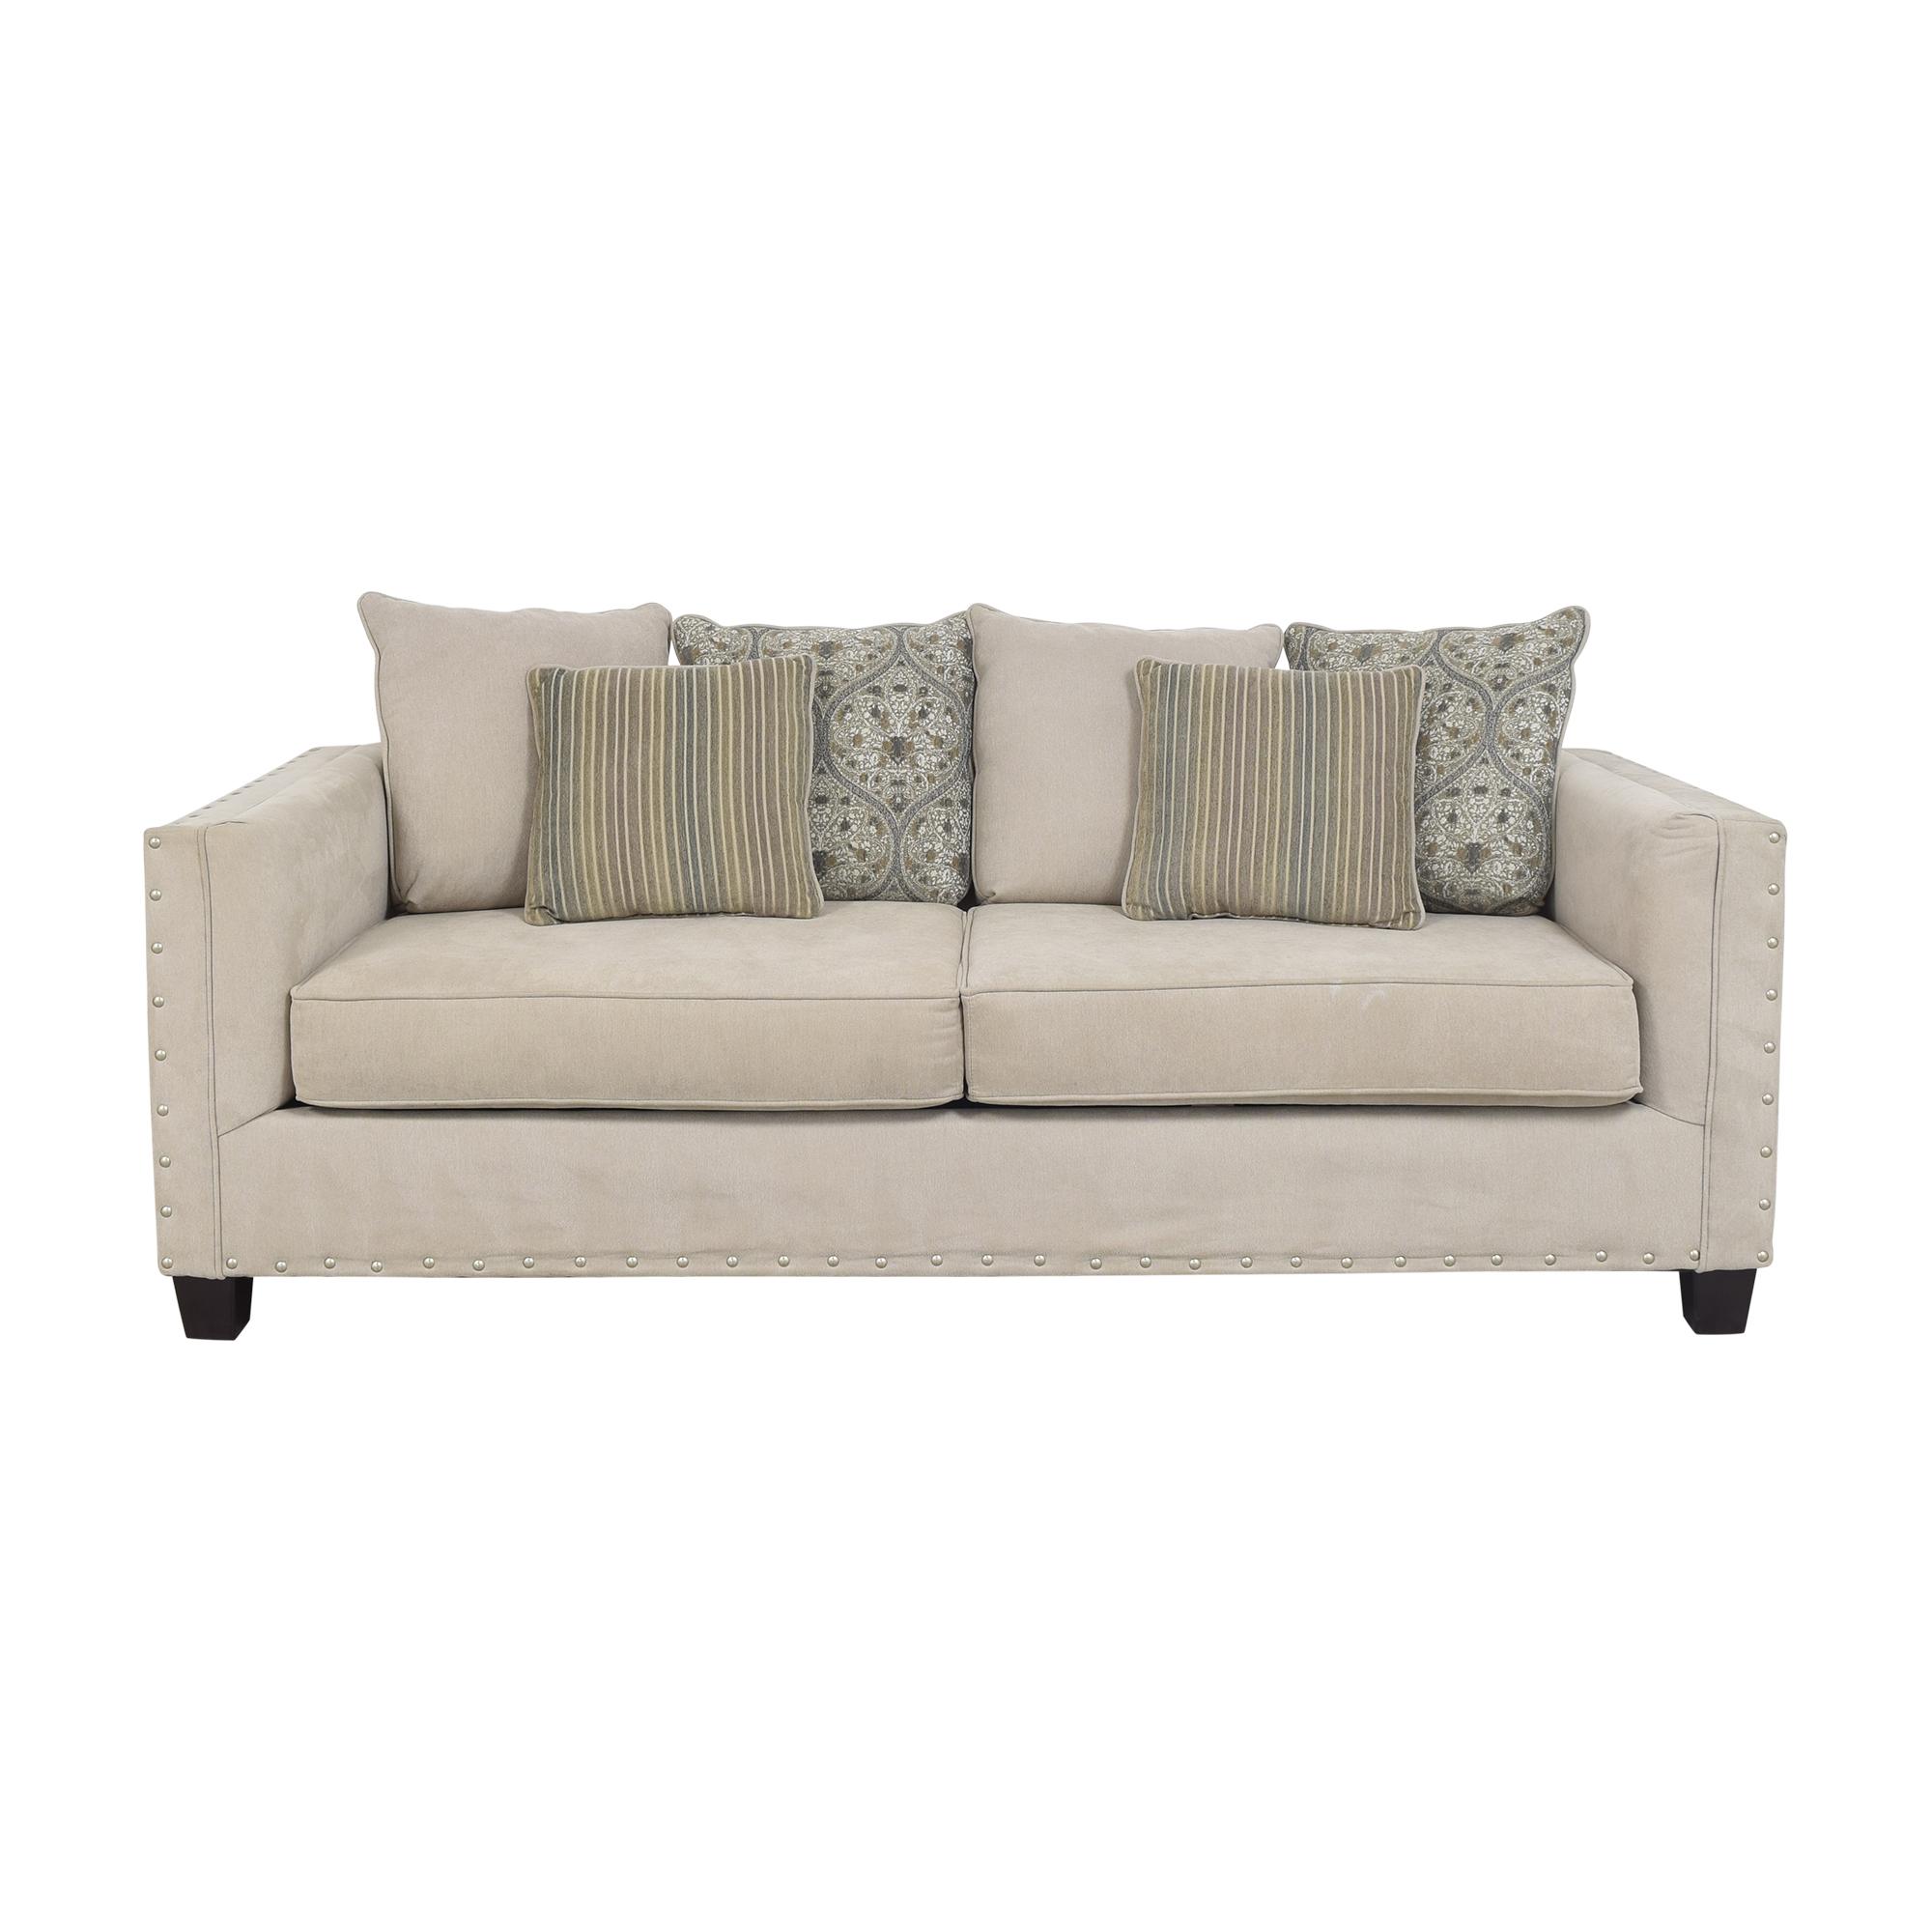 Raymour & Flanigan Two Cushion Sofa Raymour & Flanigan